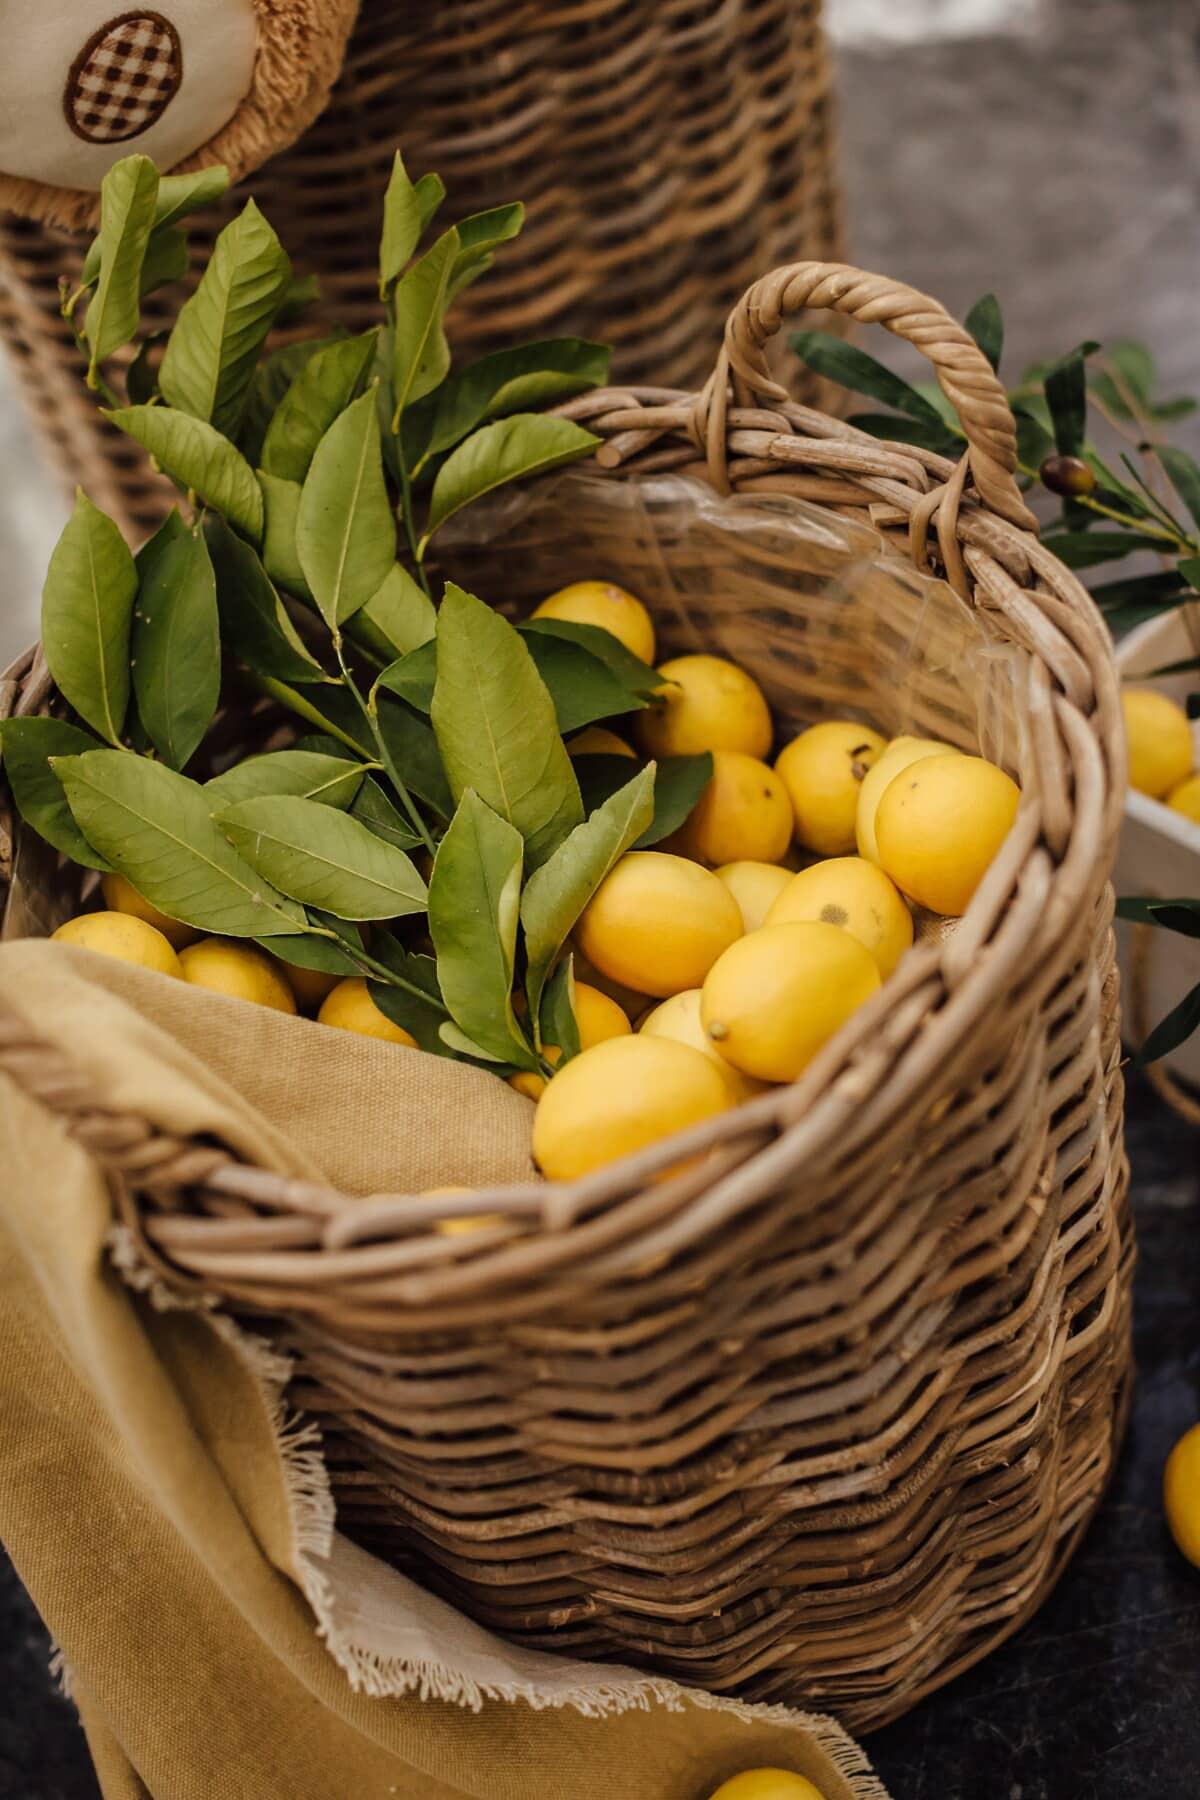 organic, lemon, wicker basket, marketplace, products, merchandise, basket, citrus, produce, fruit